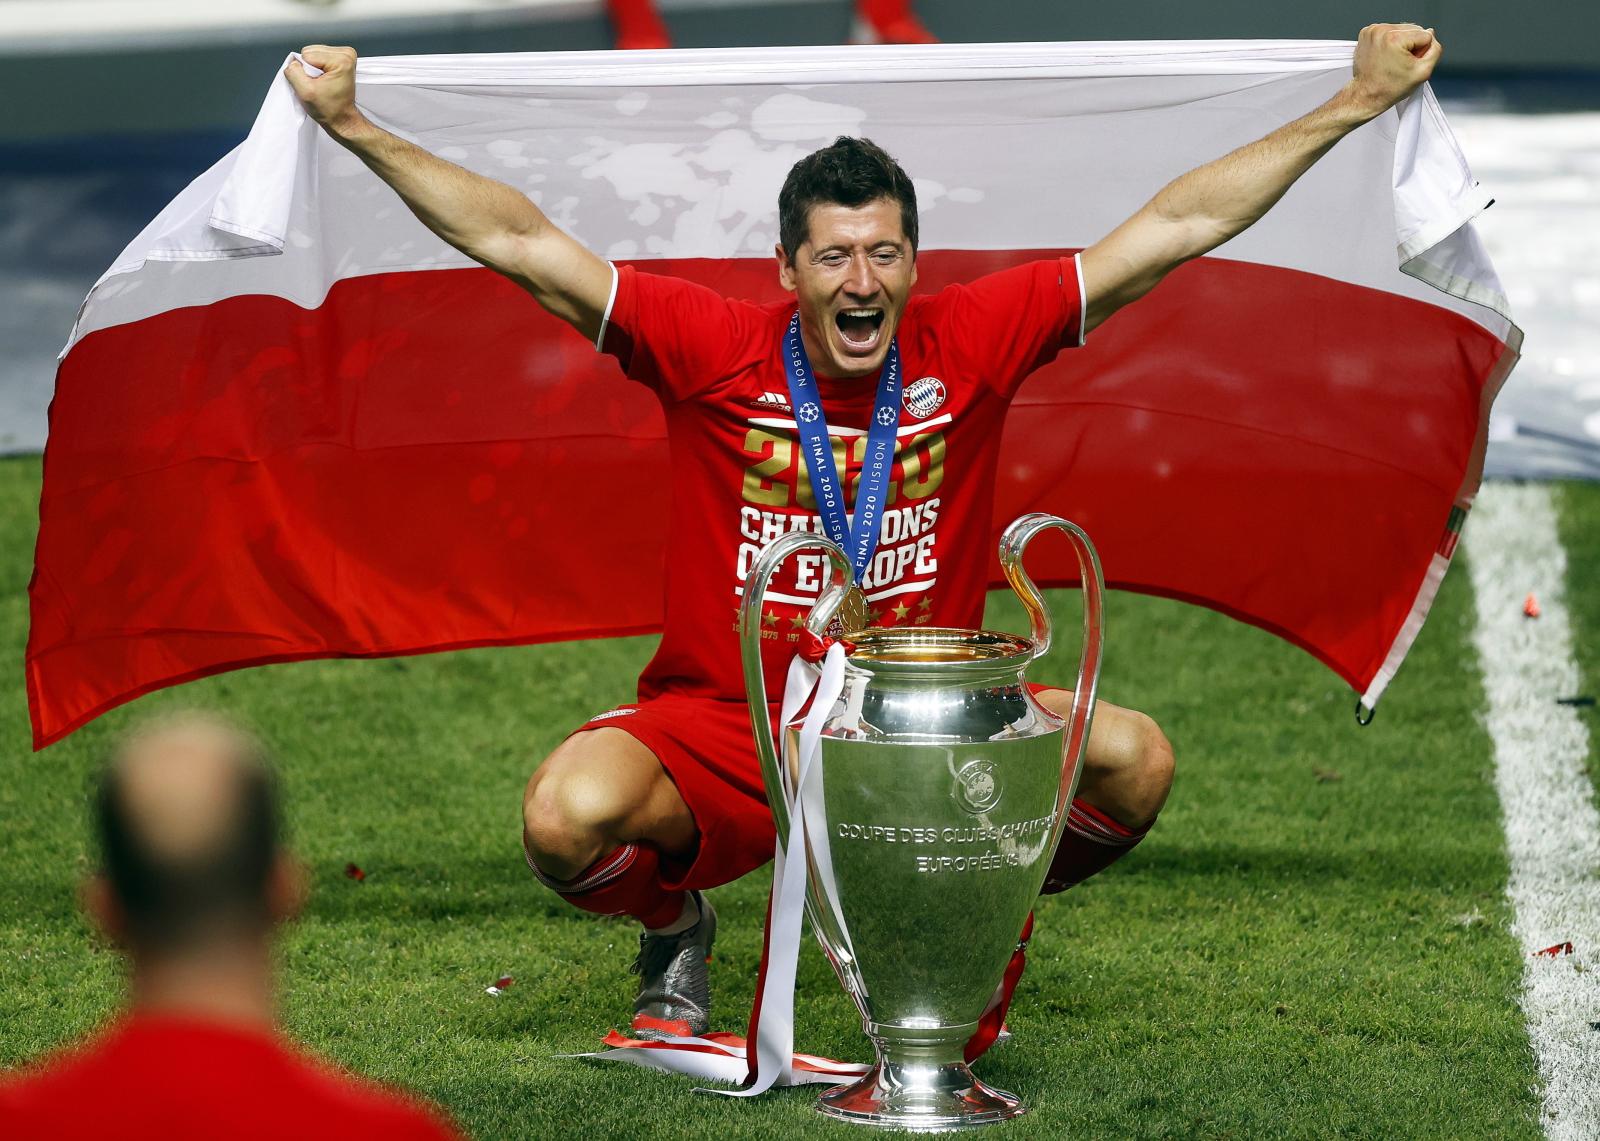 Bayern Munichs Robert Lewandowski celebrates with the trophy after winning the UEFA Champions League final between Paris Saint-Germain and Bayern Munich (1-0) in Lisbon, Portugal, 23 August 2020.